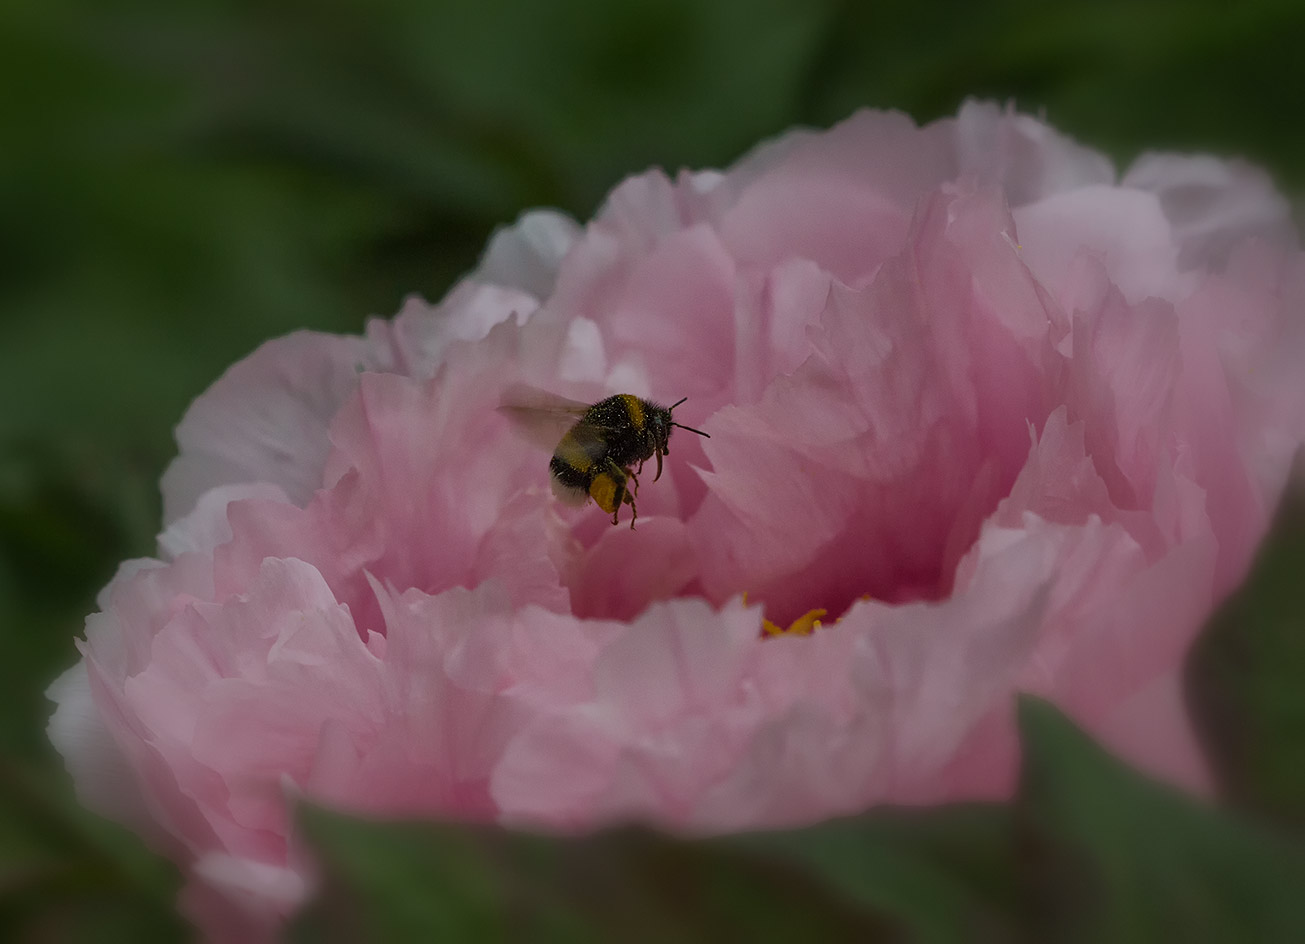 Dunkle Erdhummel sammel Pollen in den Blüten einer Rosa Pfingstrose, 16. Mai 2017.